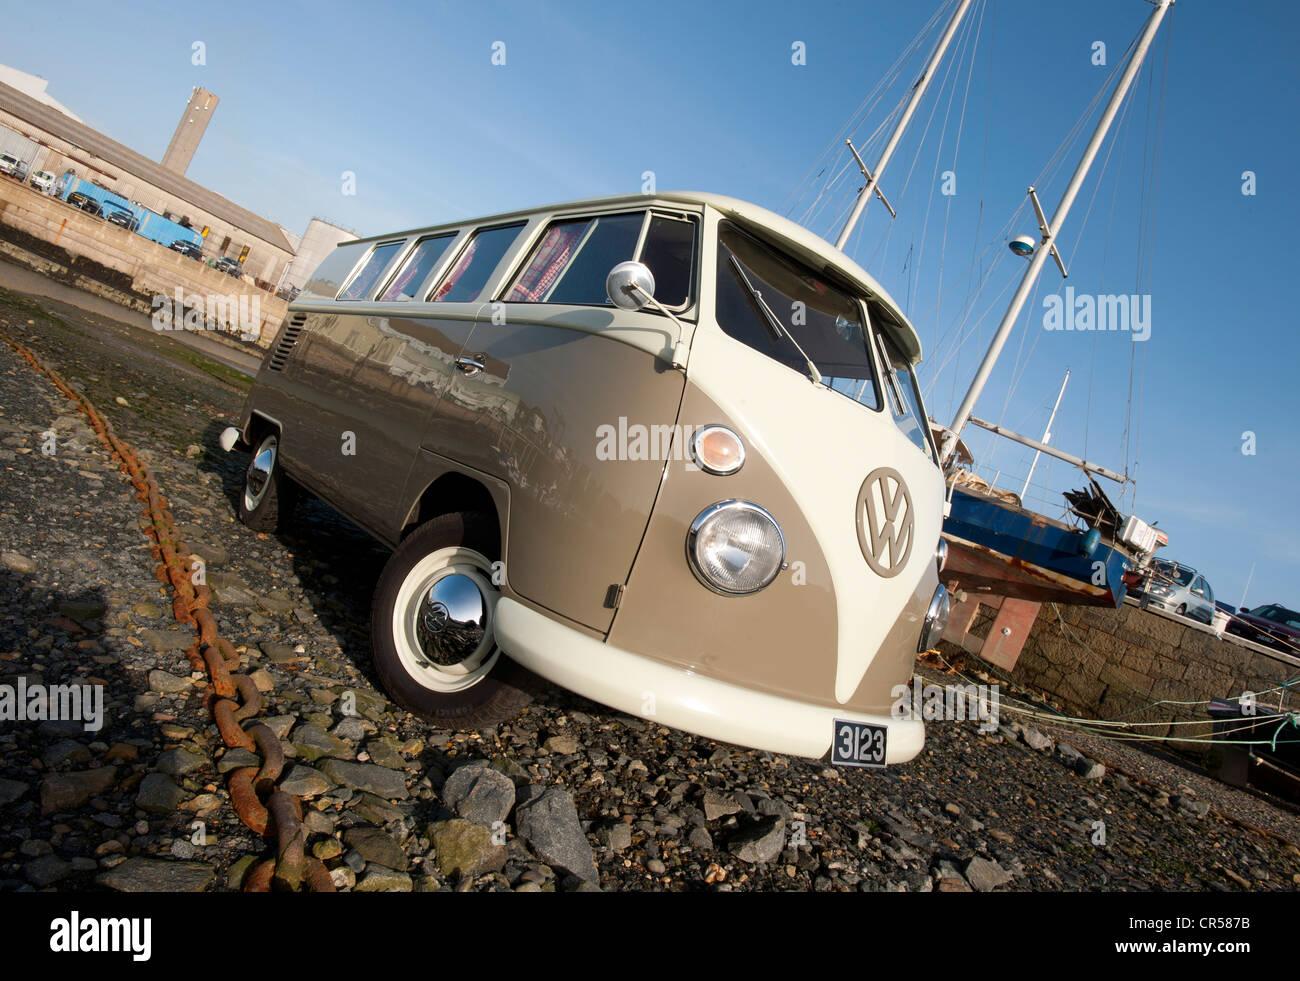 Split screen VW camper van, classic vehicle - Stock Image